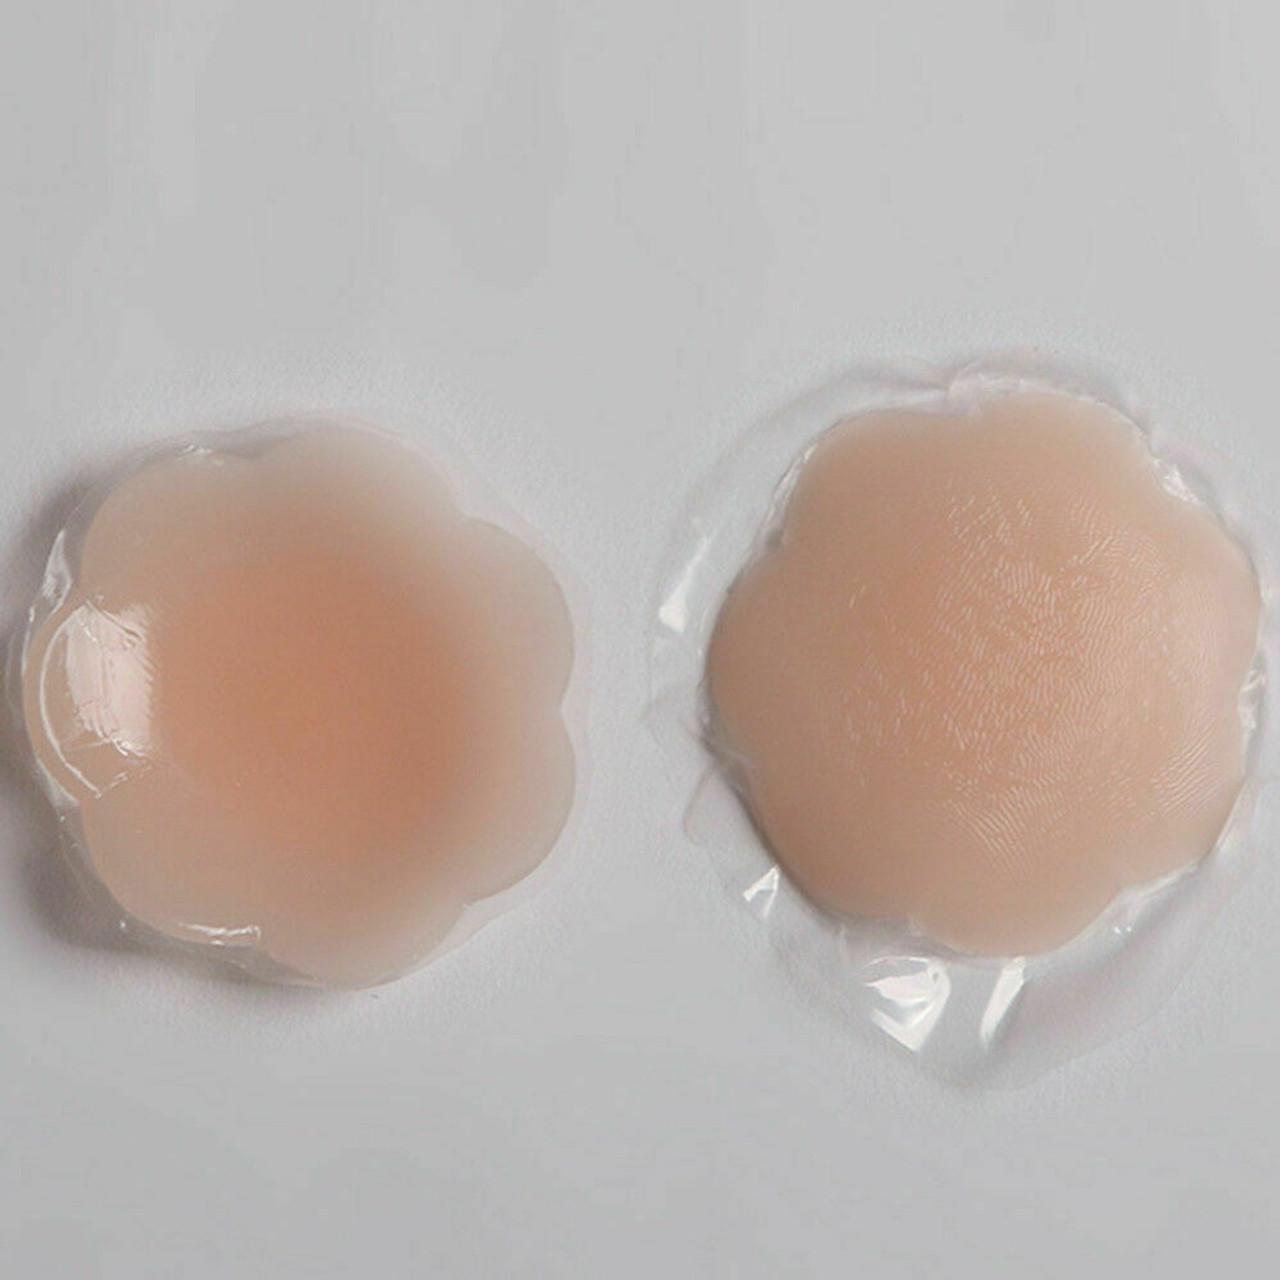 5 Pairs Nippleless Cover Pasties Women Reusable Adhesive Silicone Nipple Pads